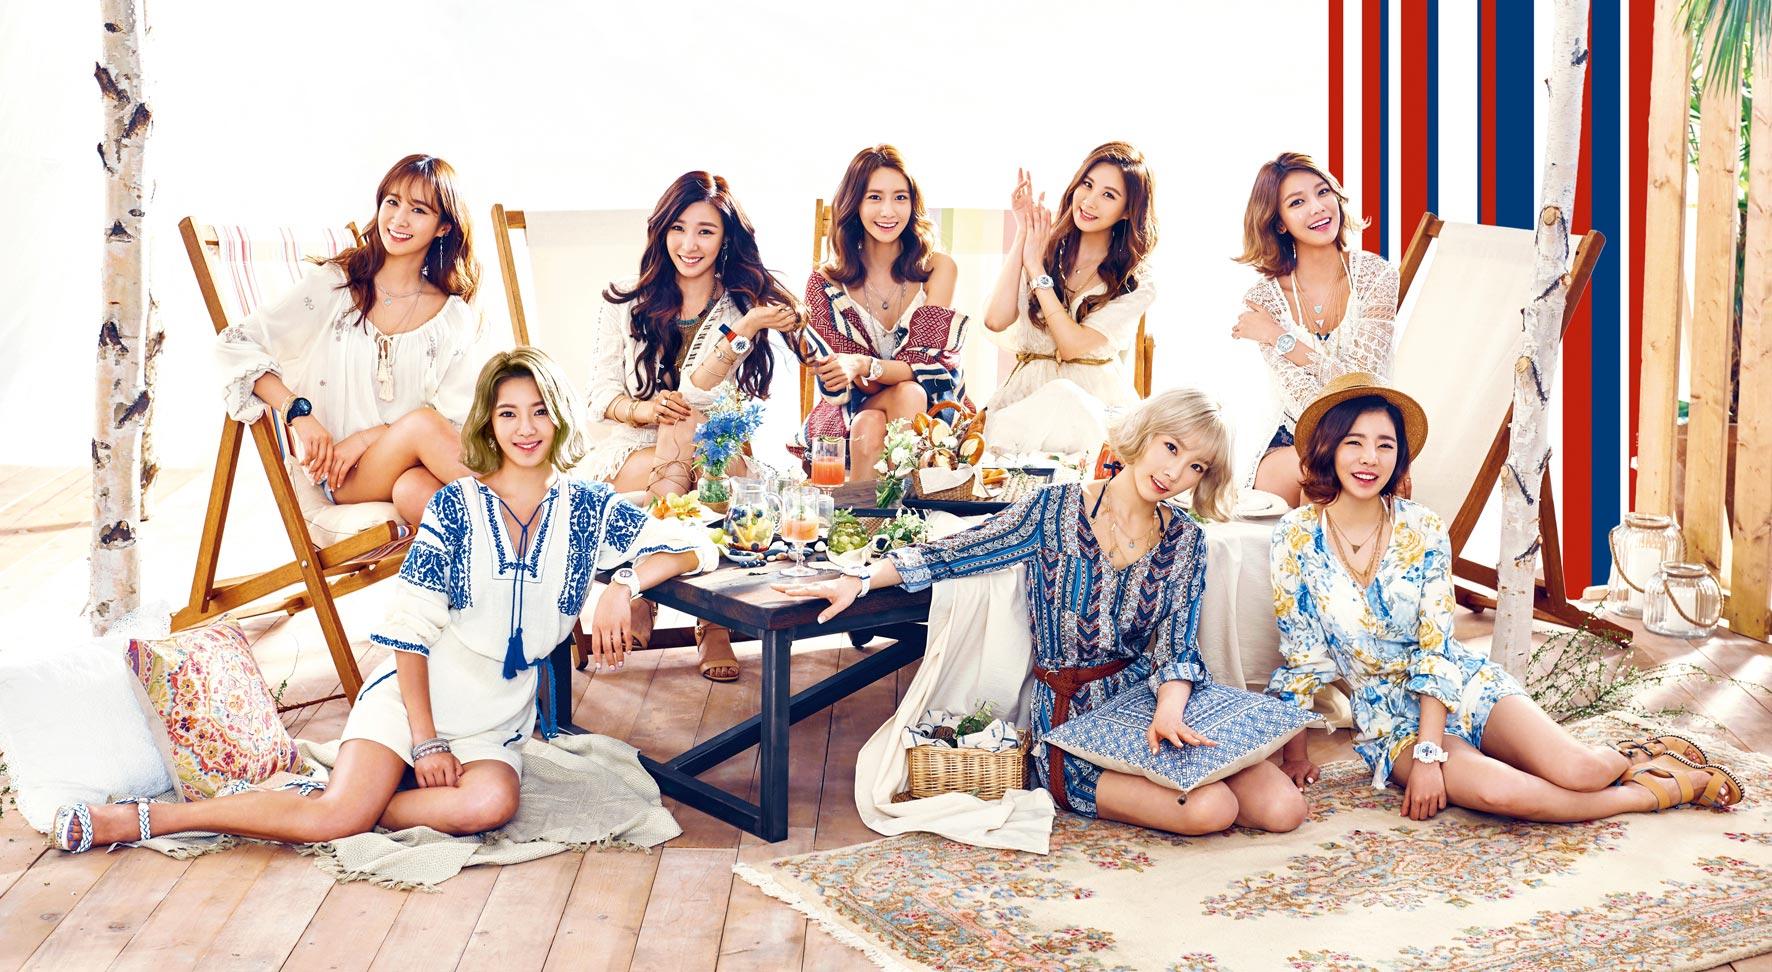 SM娛樂市值蒸發2.6億